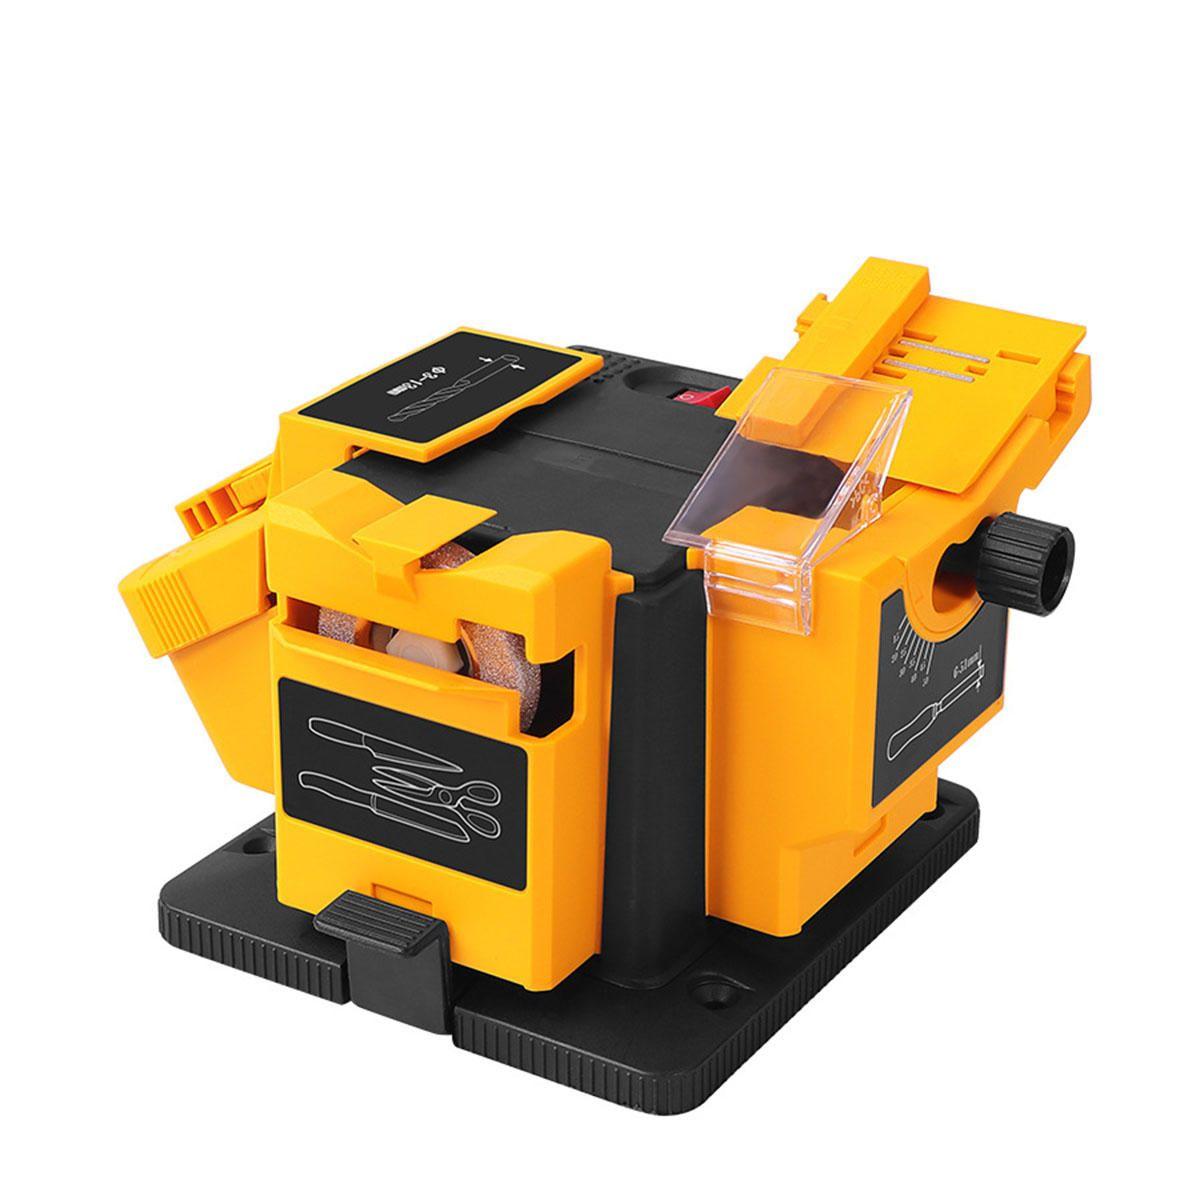 FFL US$47.09 220V 6700RPM Multi-function Electric Sharpening Tool Grinding Rig Twist Drill Grinding Machine Household Scissors Kitchen Sharpener